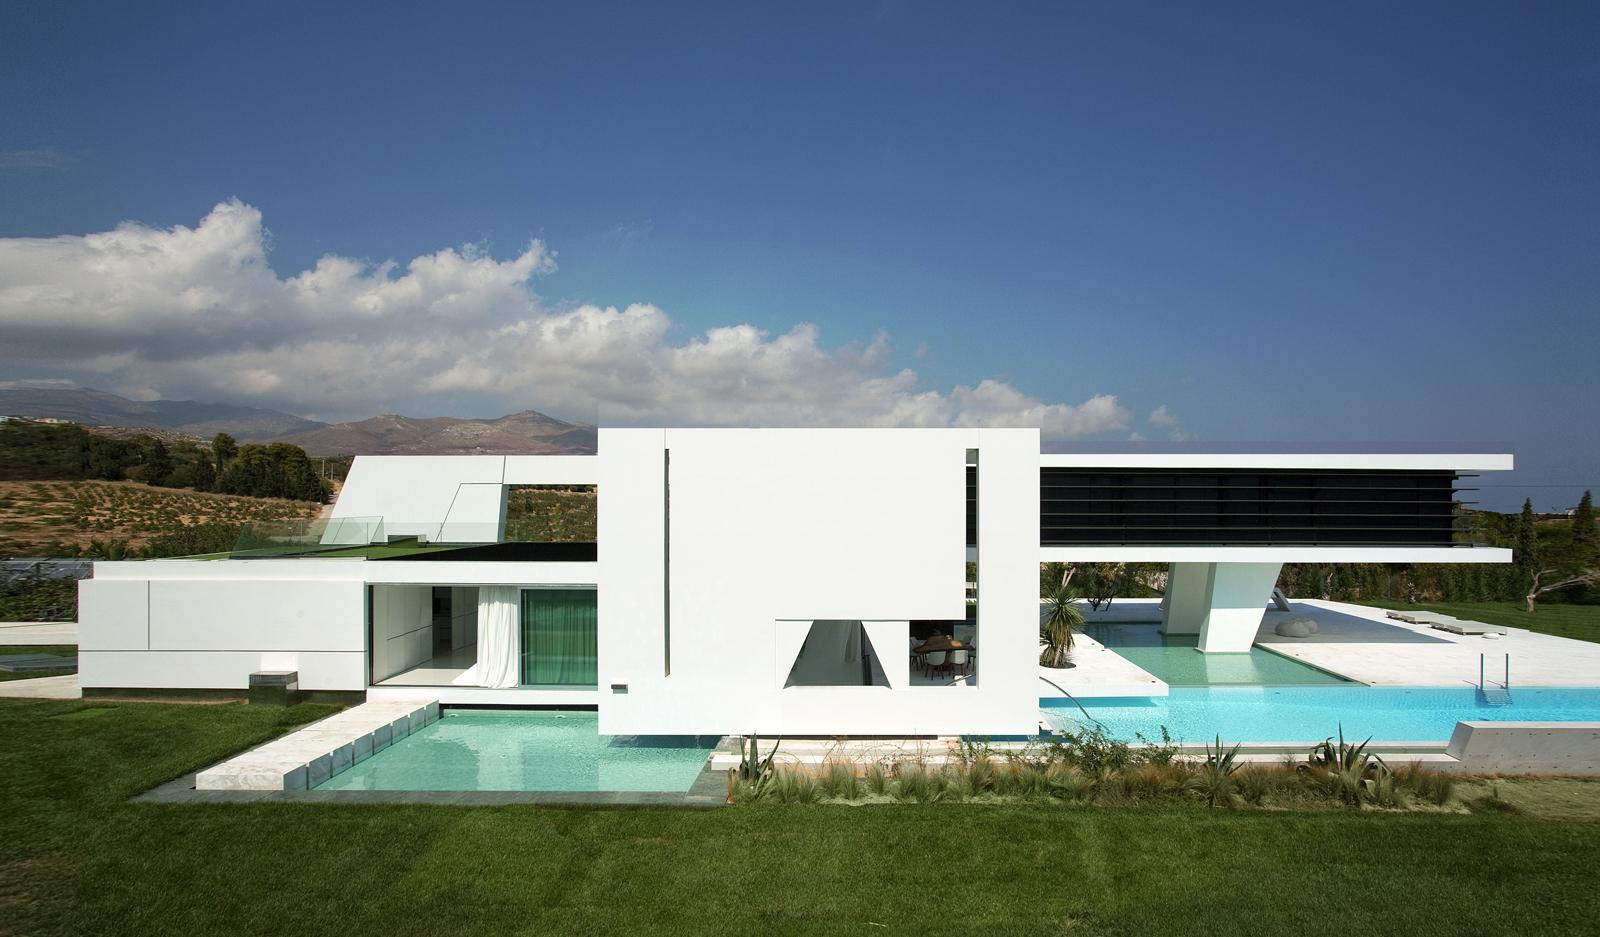 h3 314 architecture studio the superslice. Black Bedroom Furniture Sets. Home Design Ideas